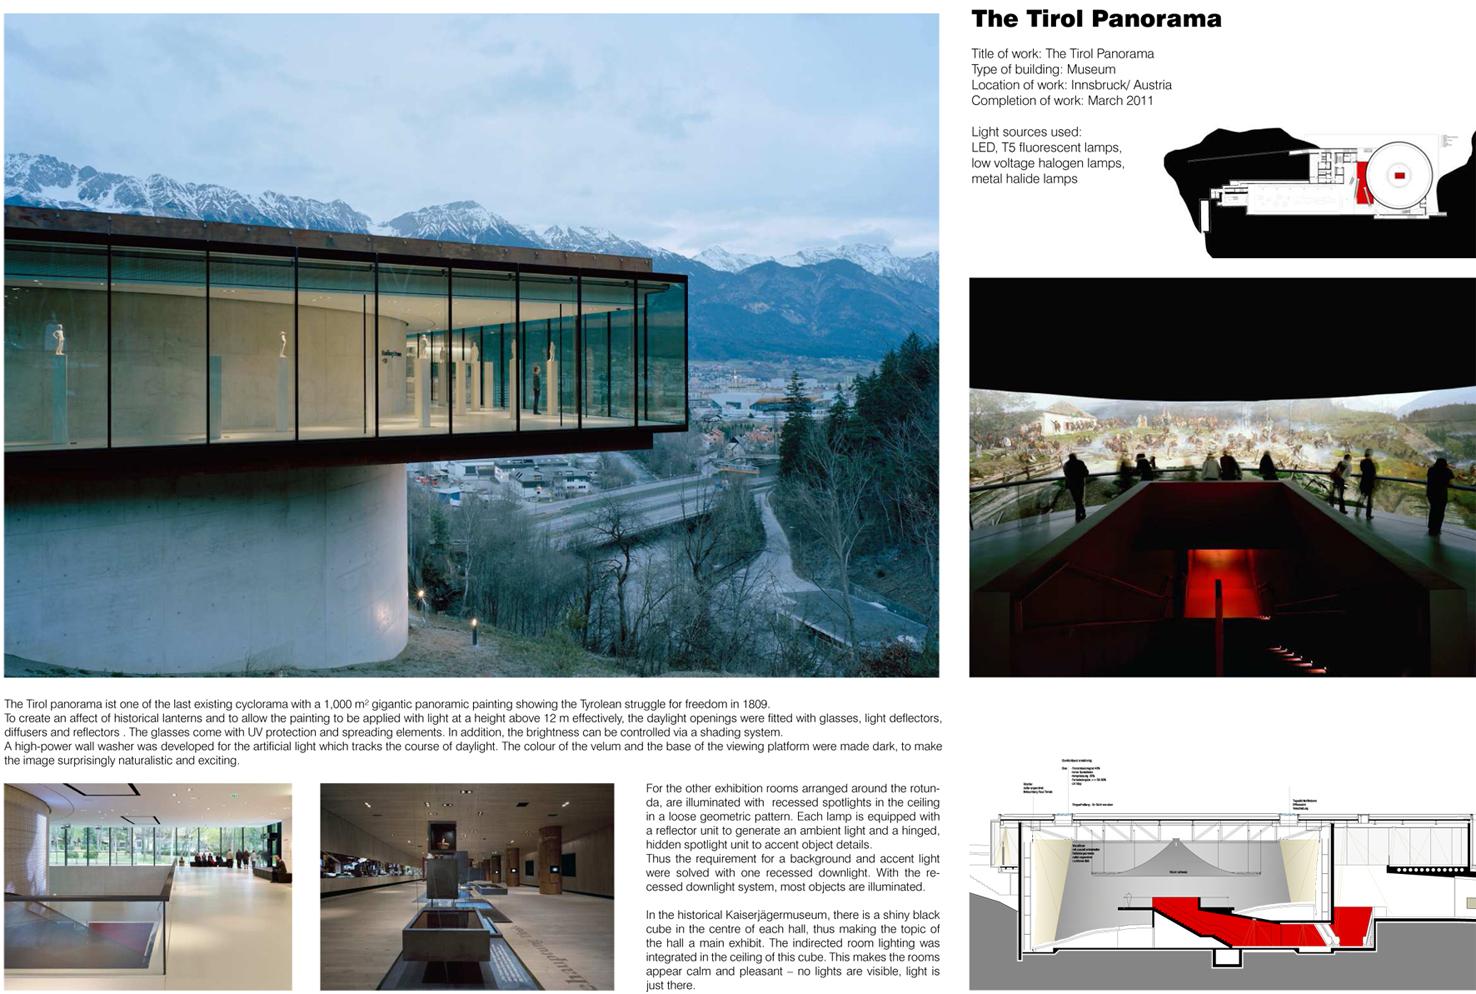 Das Tirol Panorama lamina